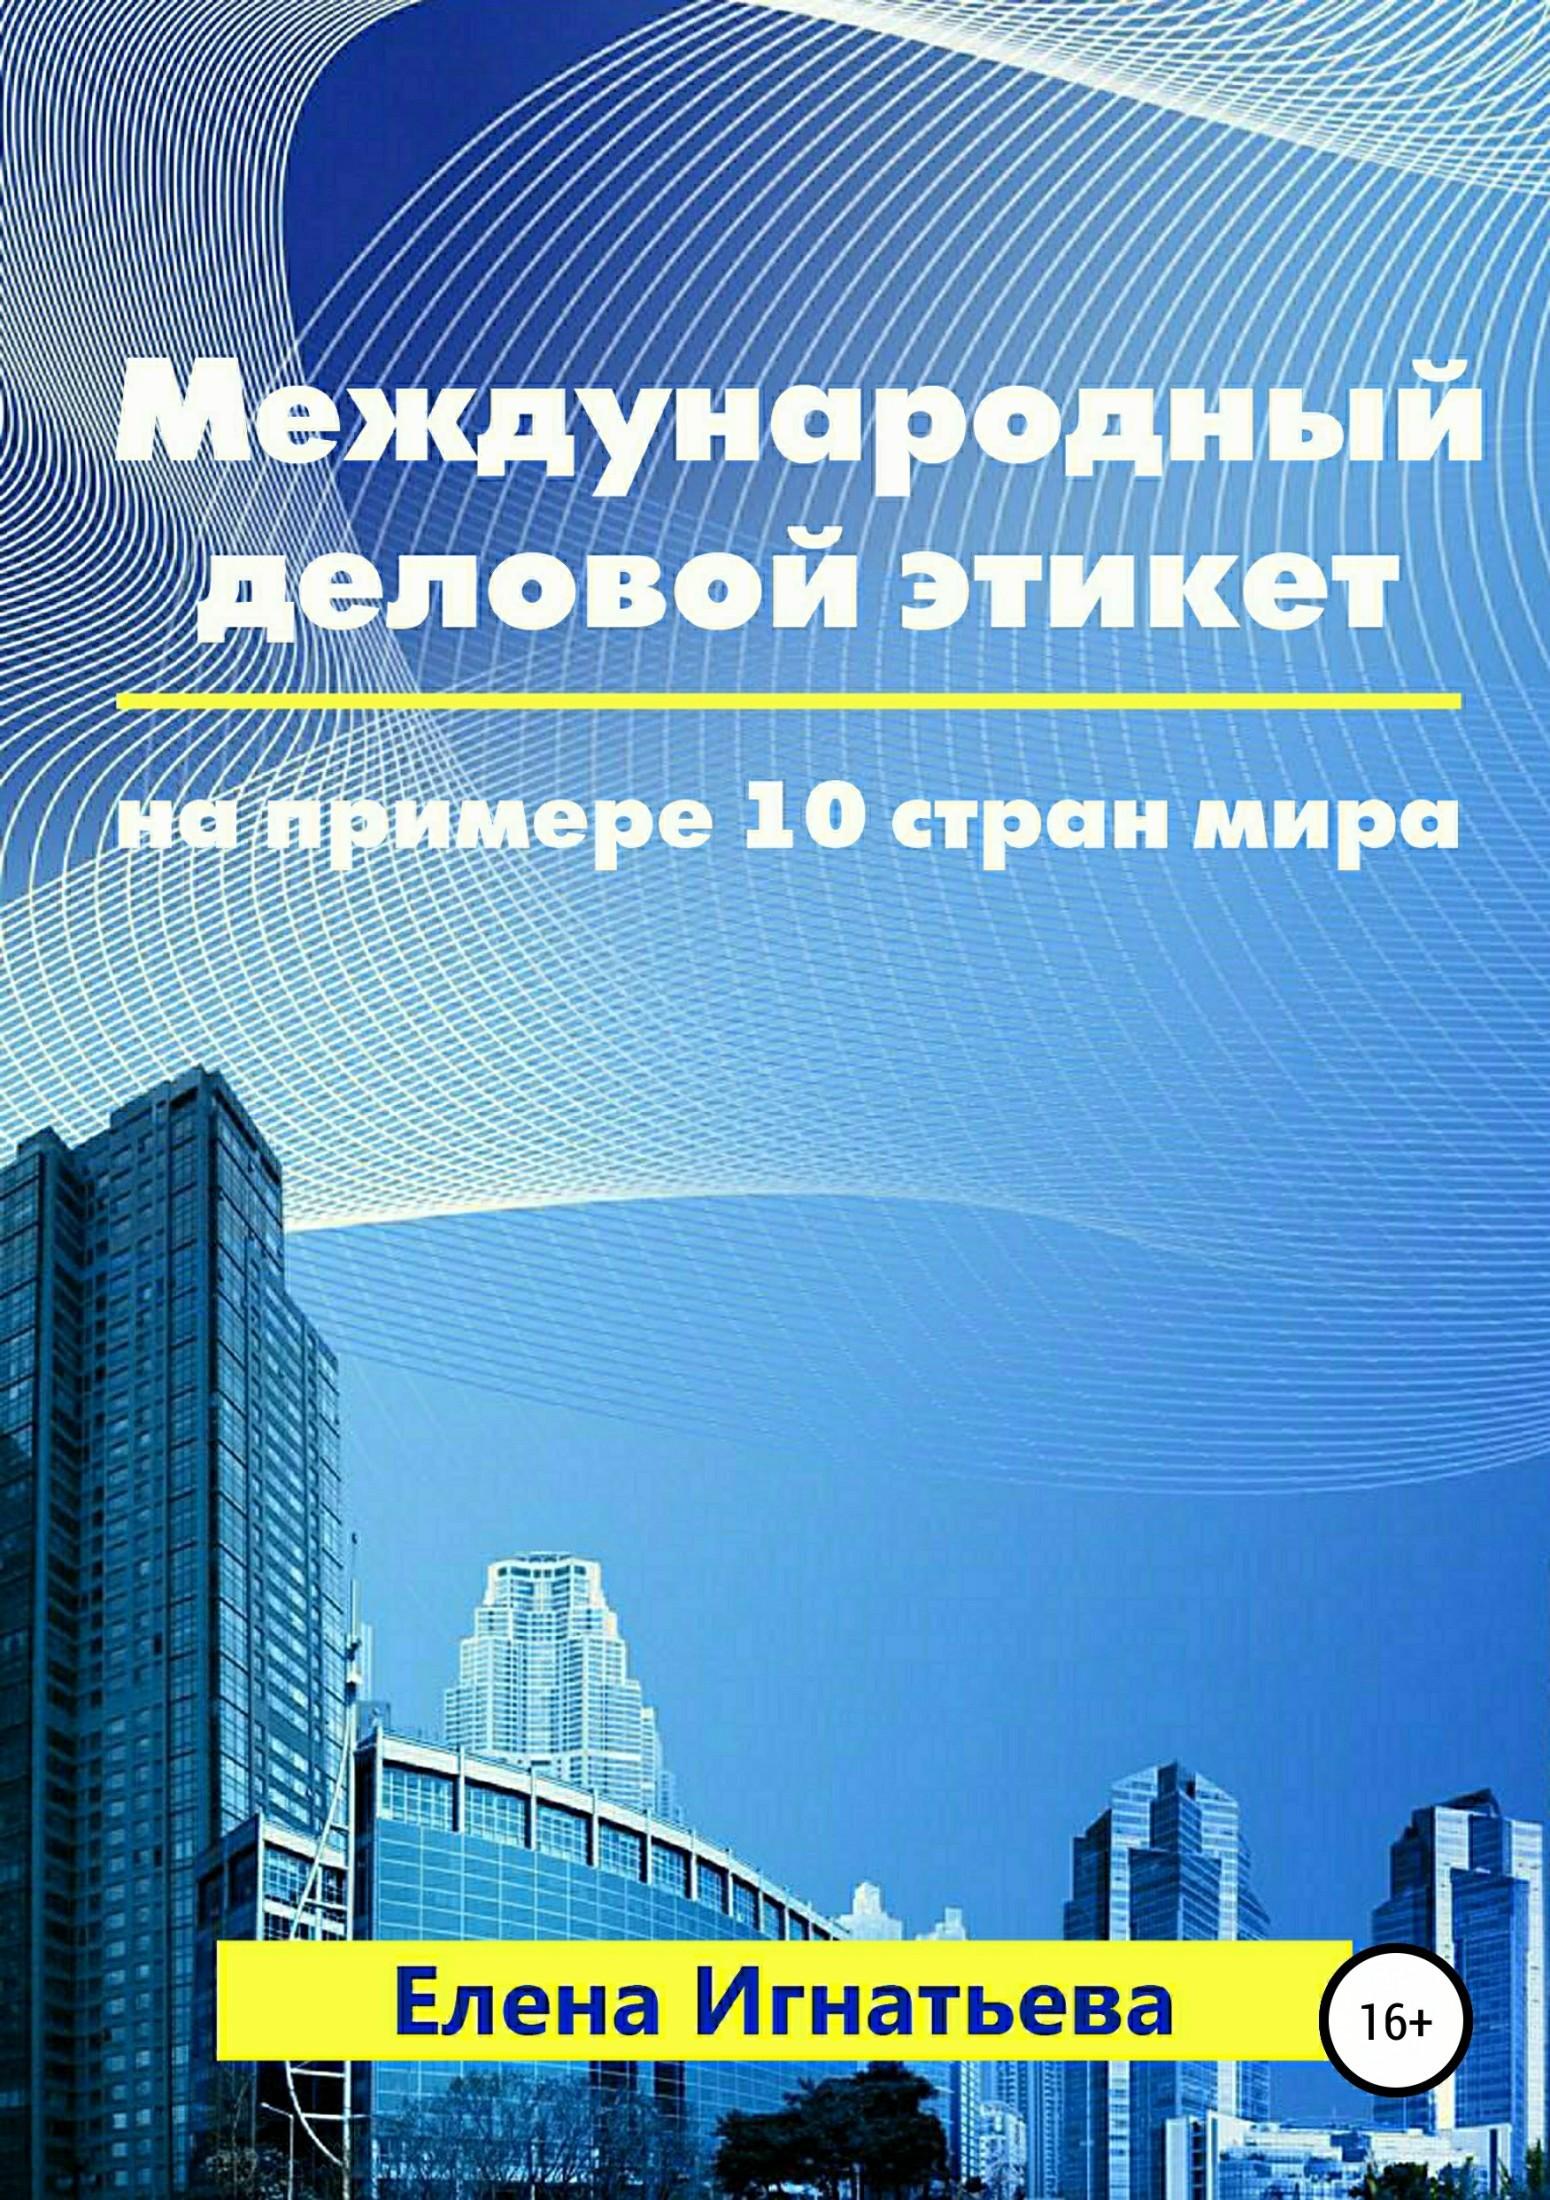 Обложка книги. Автор - Елена Игнатьева